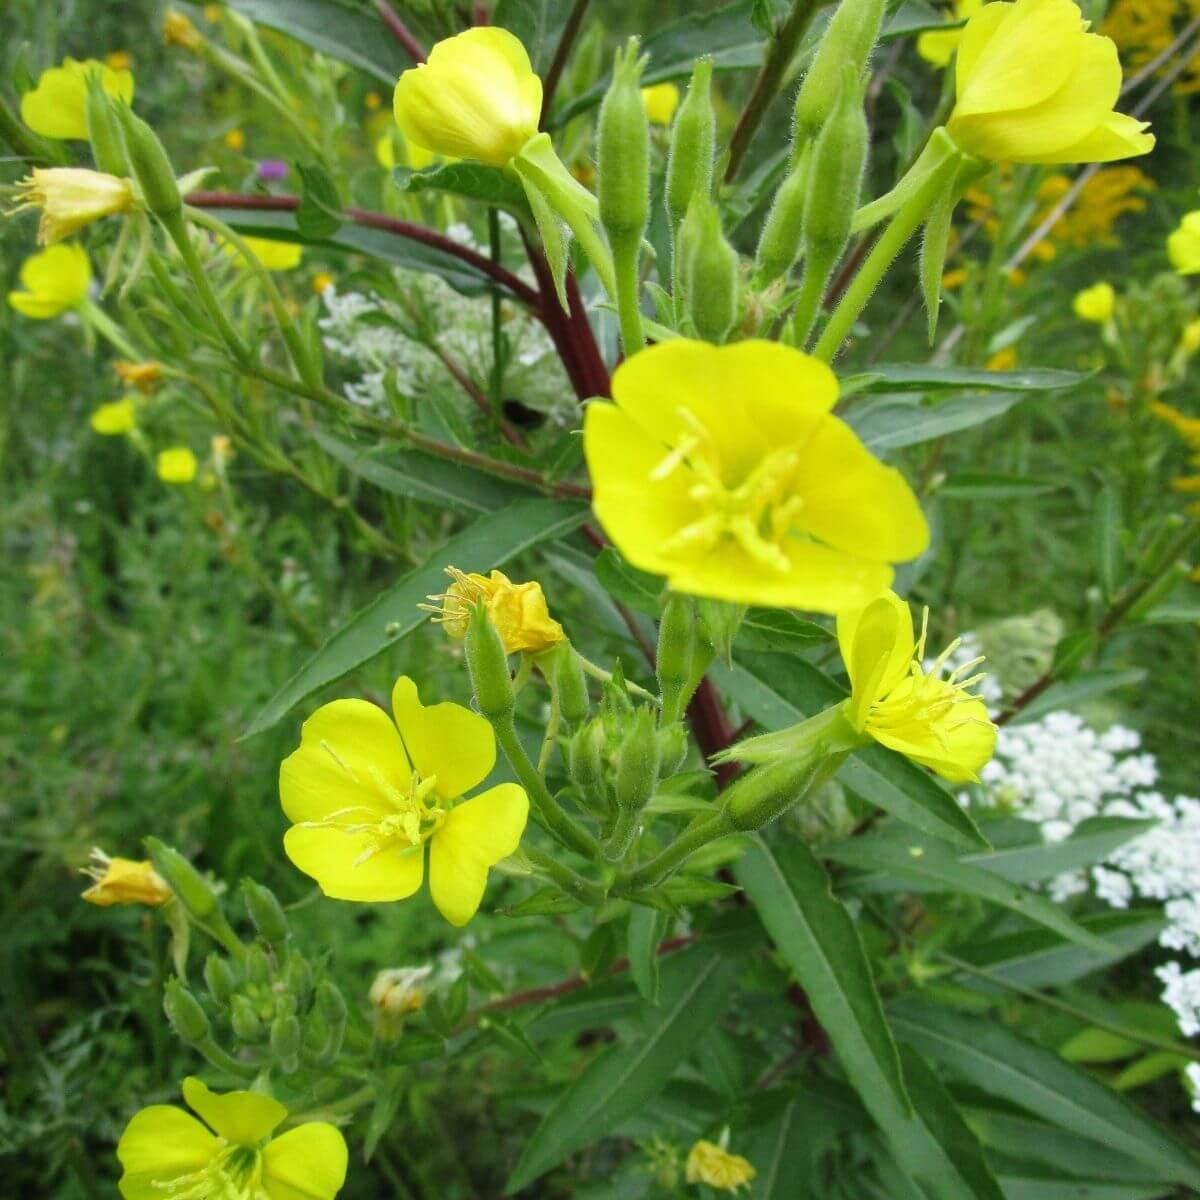 Yellow Evening Primrose in the garden.